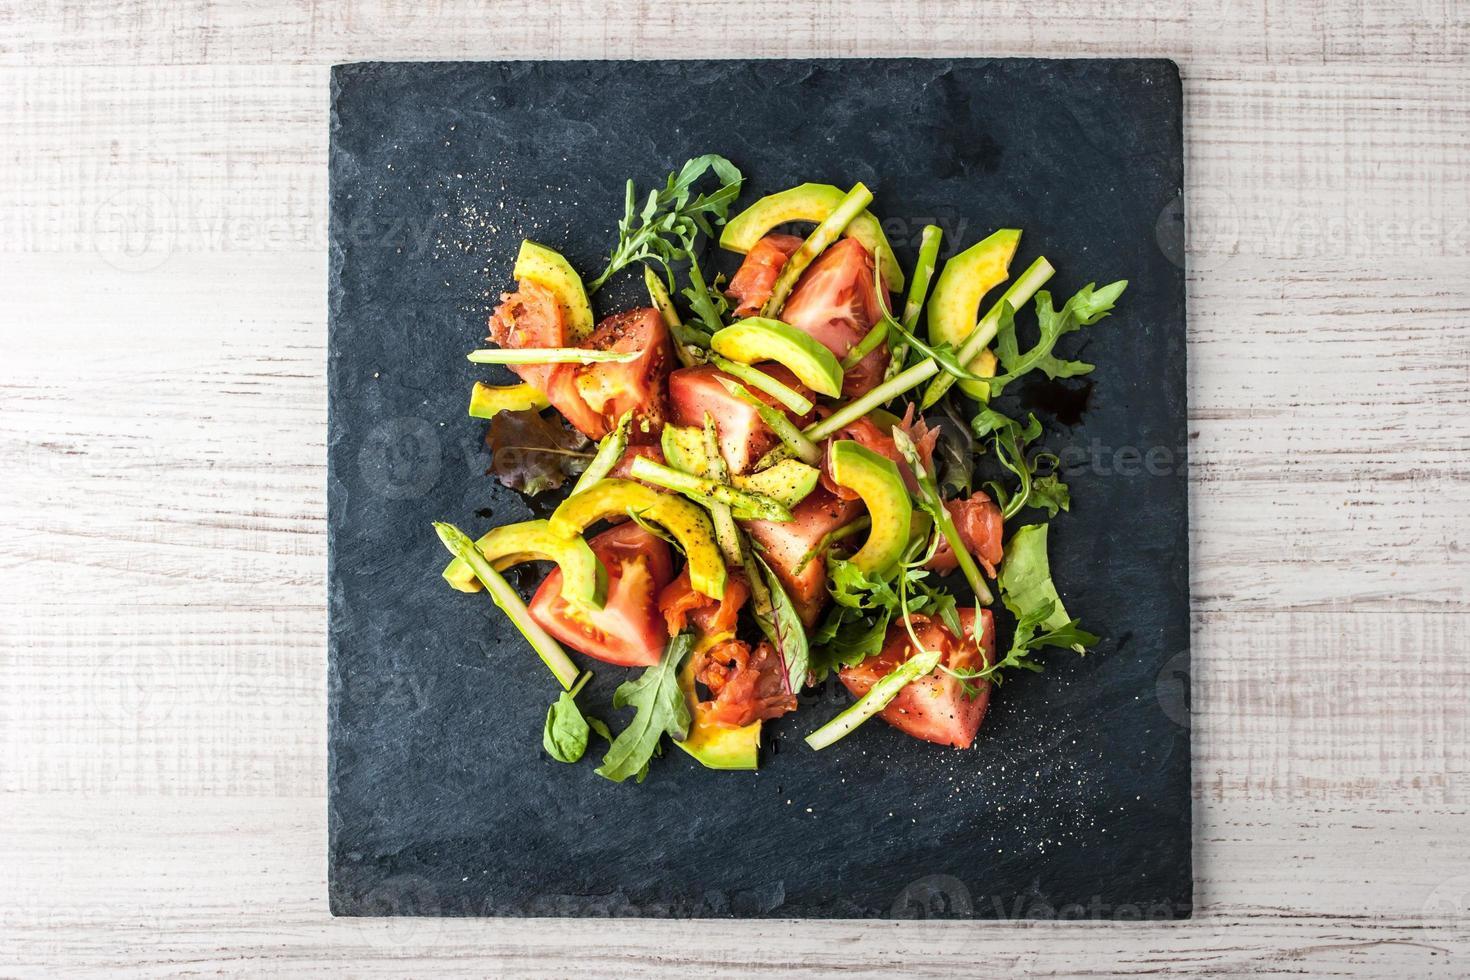 insalata con avocado, trota e asparagi vista dall'alto foto